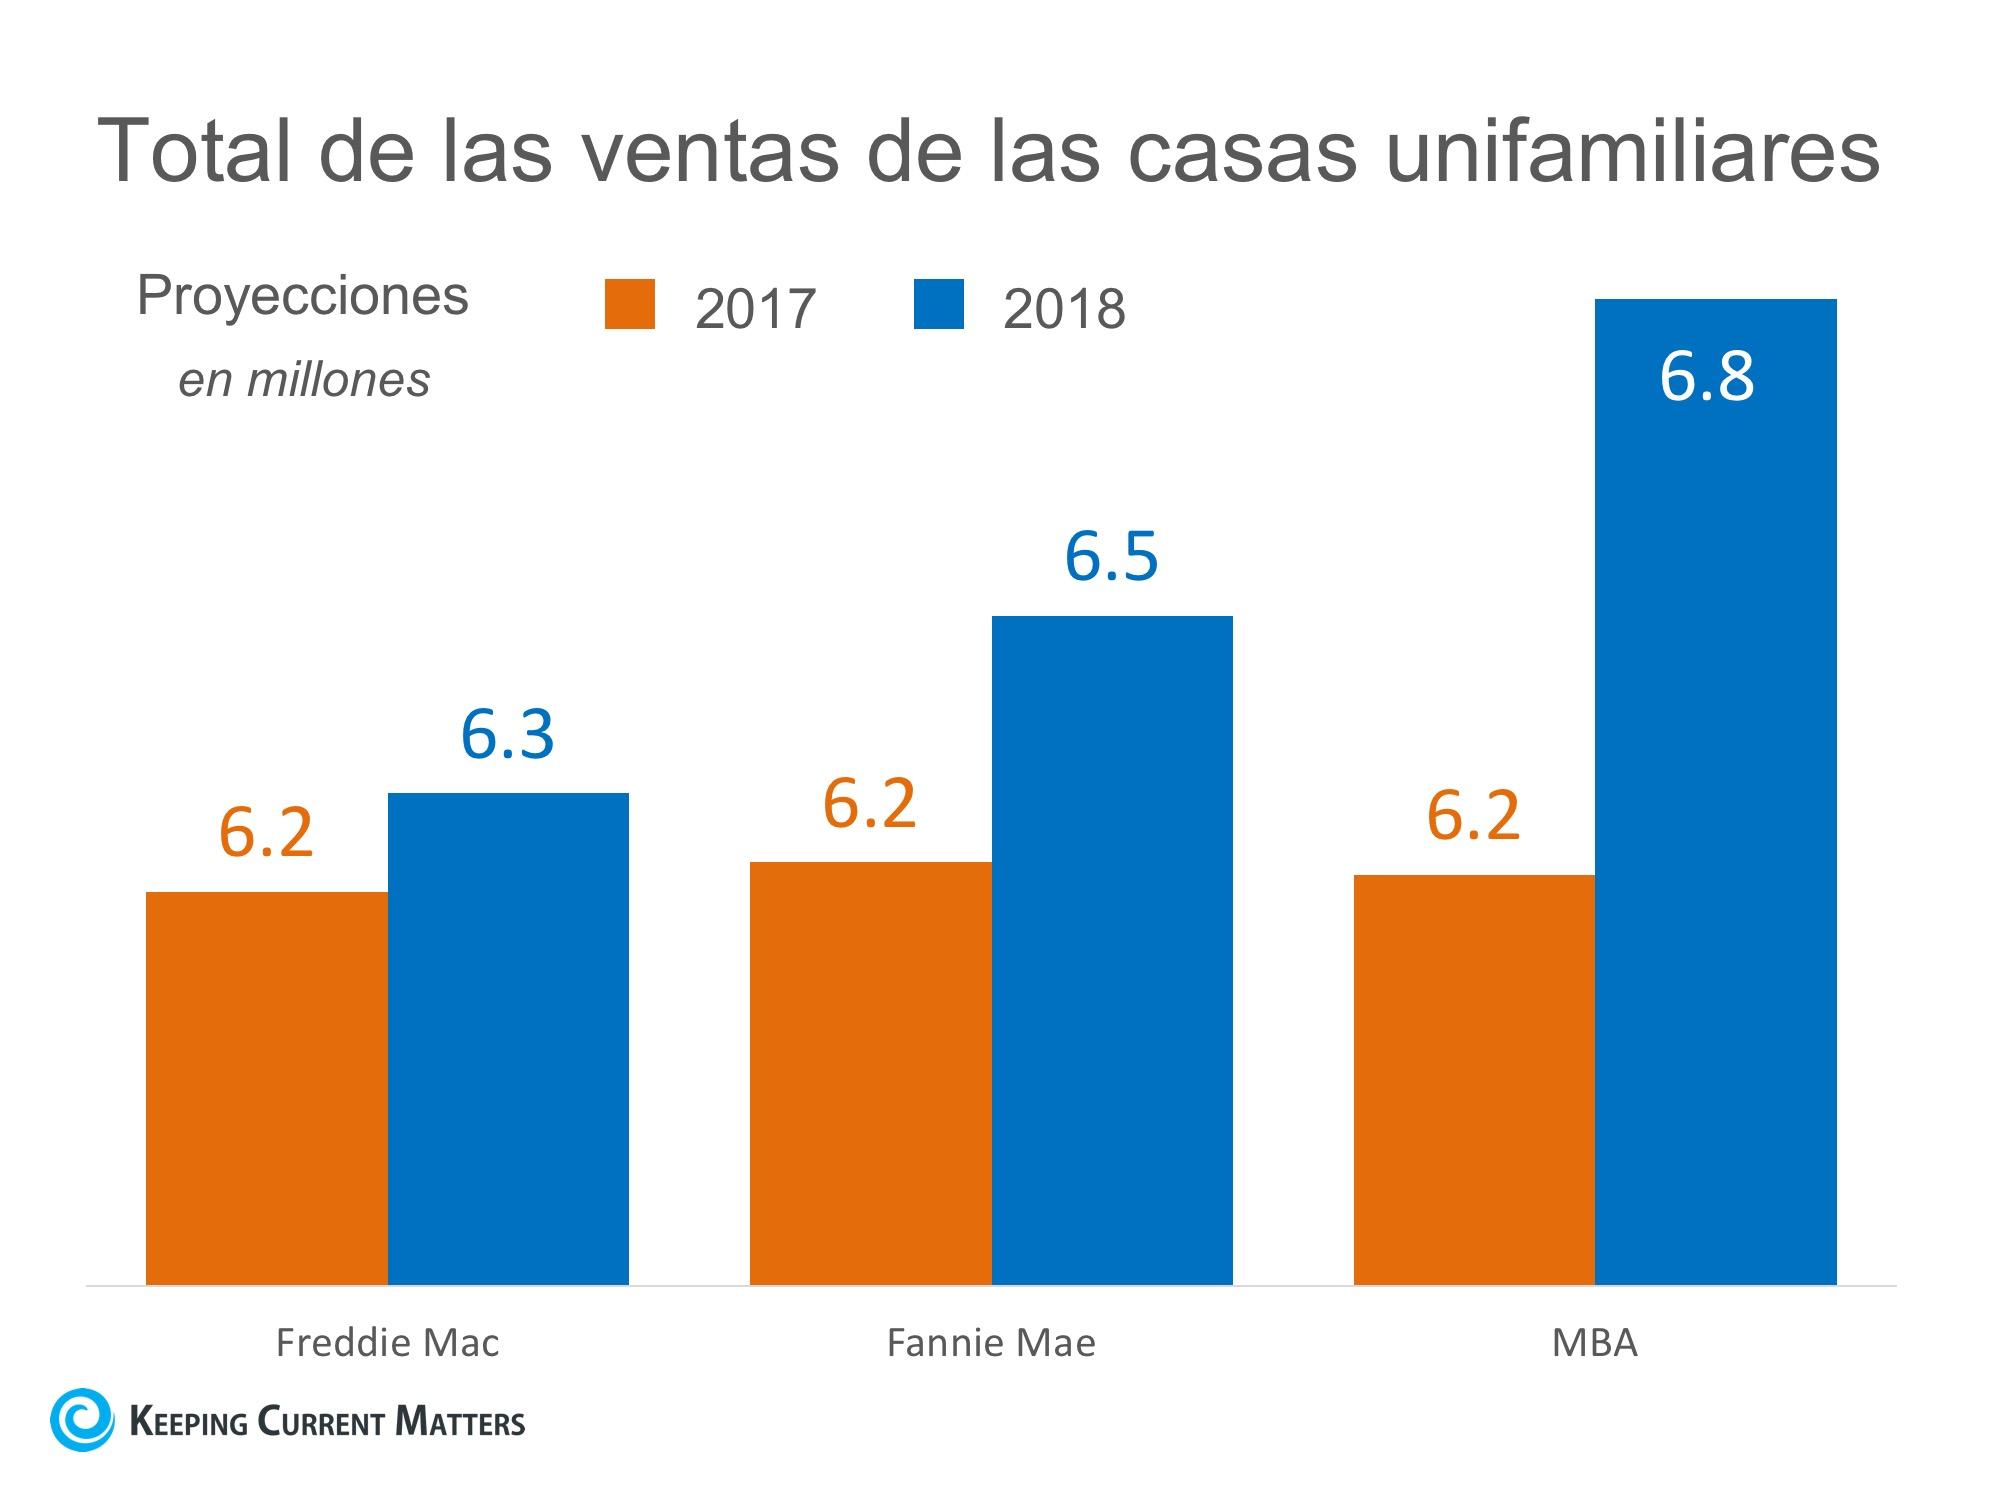 Se espera que las ventas de casas aumenten favorablemente en 2018   Keeping Current Matters